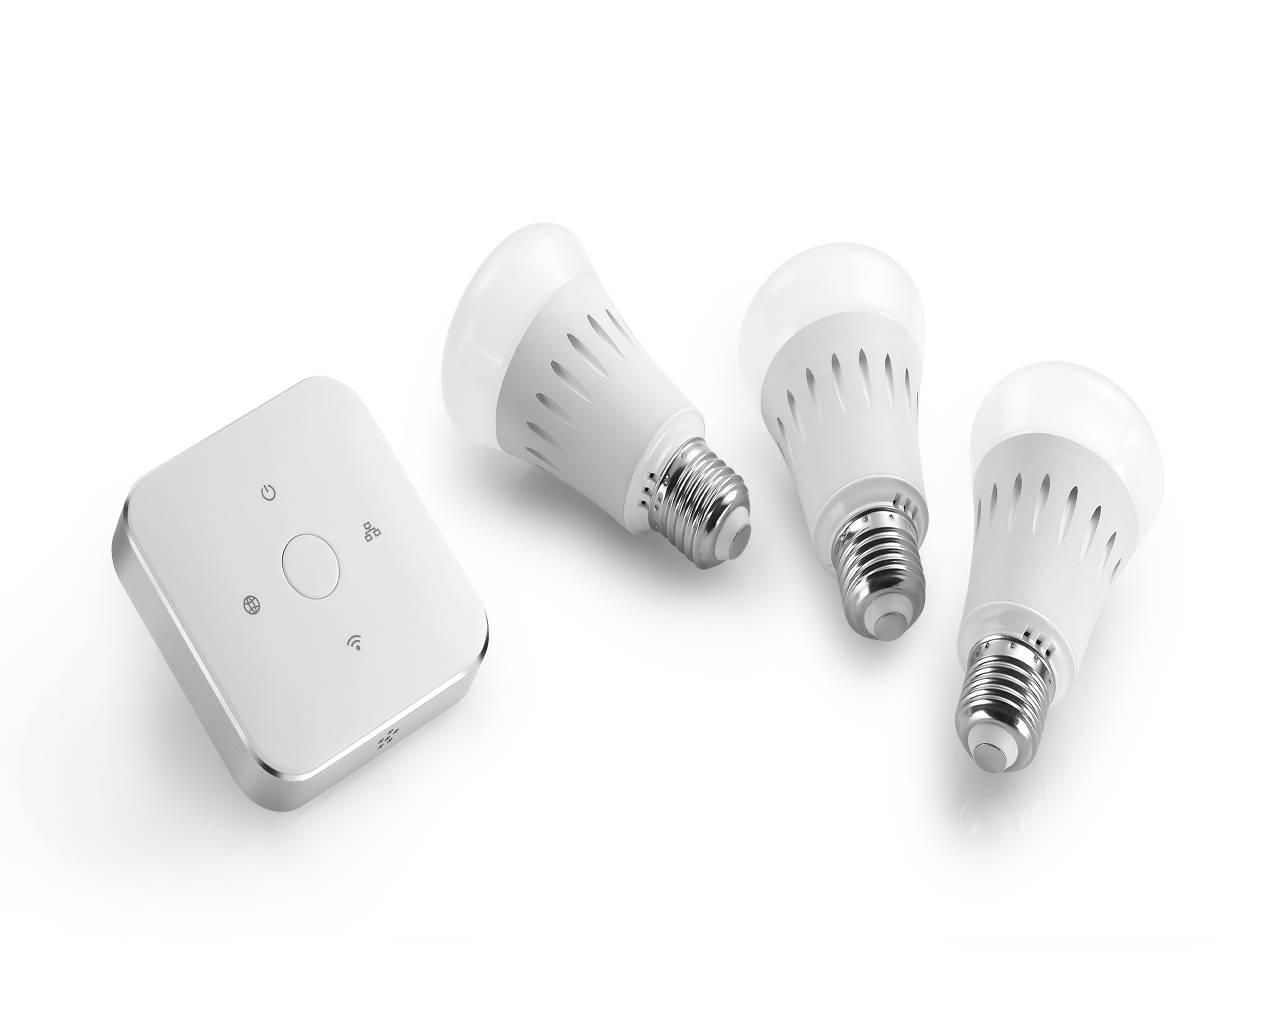 iHomeware Most Competitive Zigbee Smart Lighting System, Full Tunable White Smart LED Bulb, Eye prot